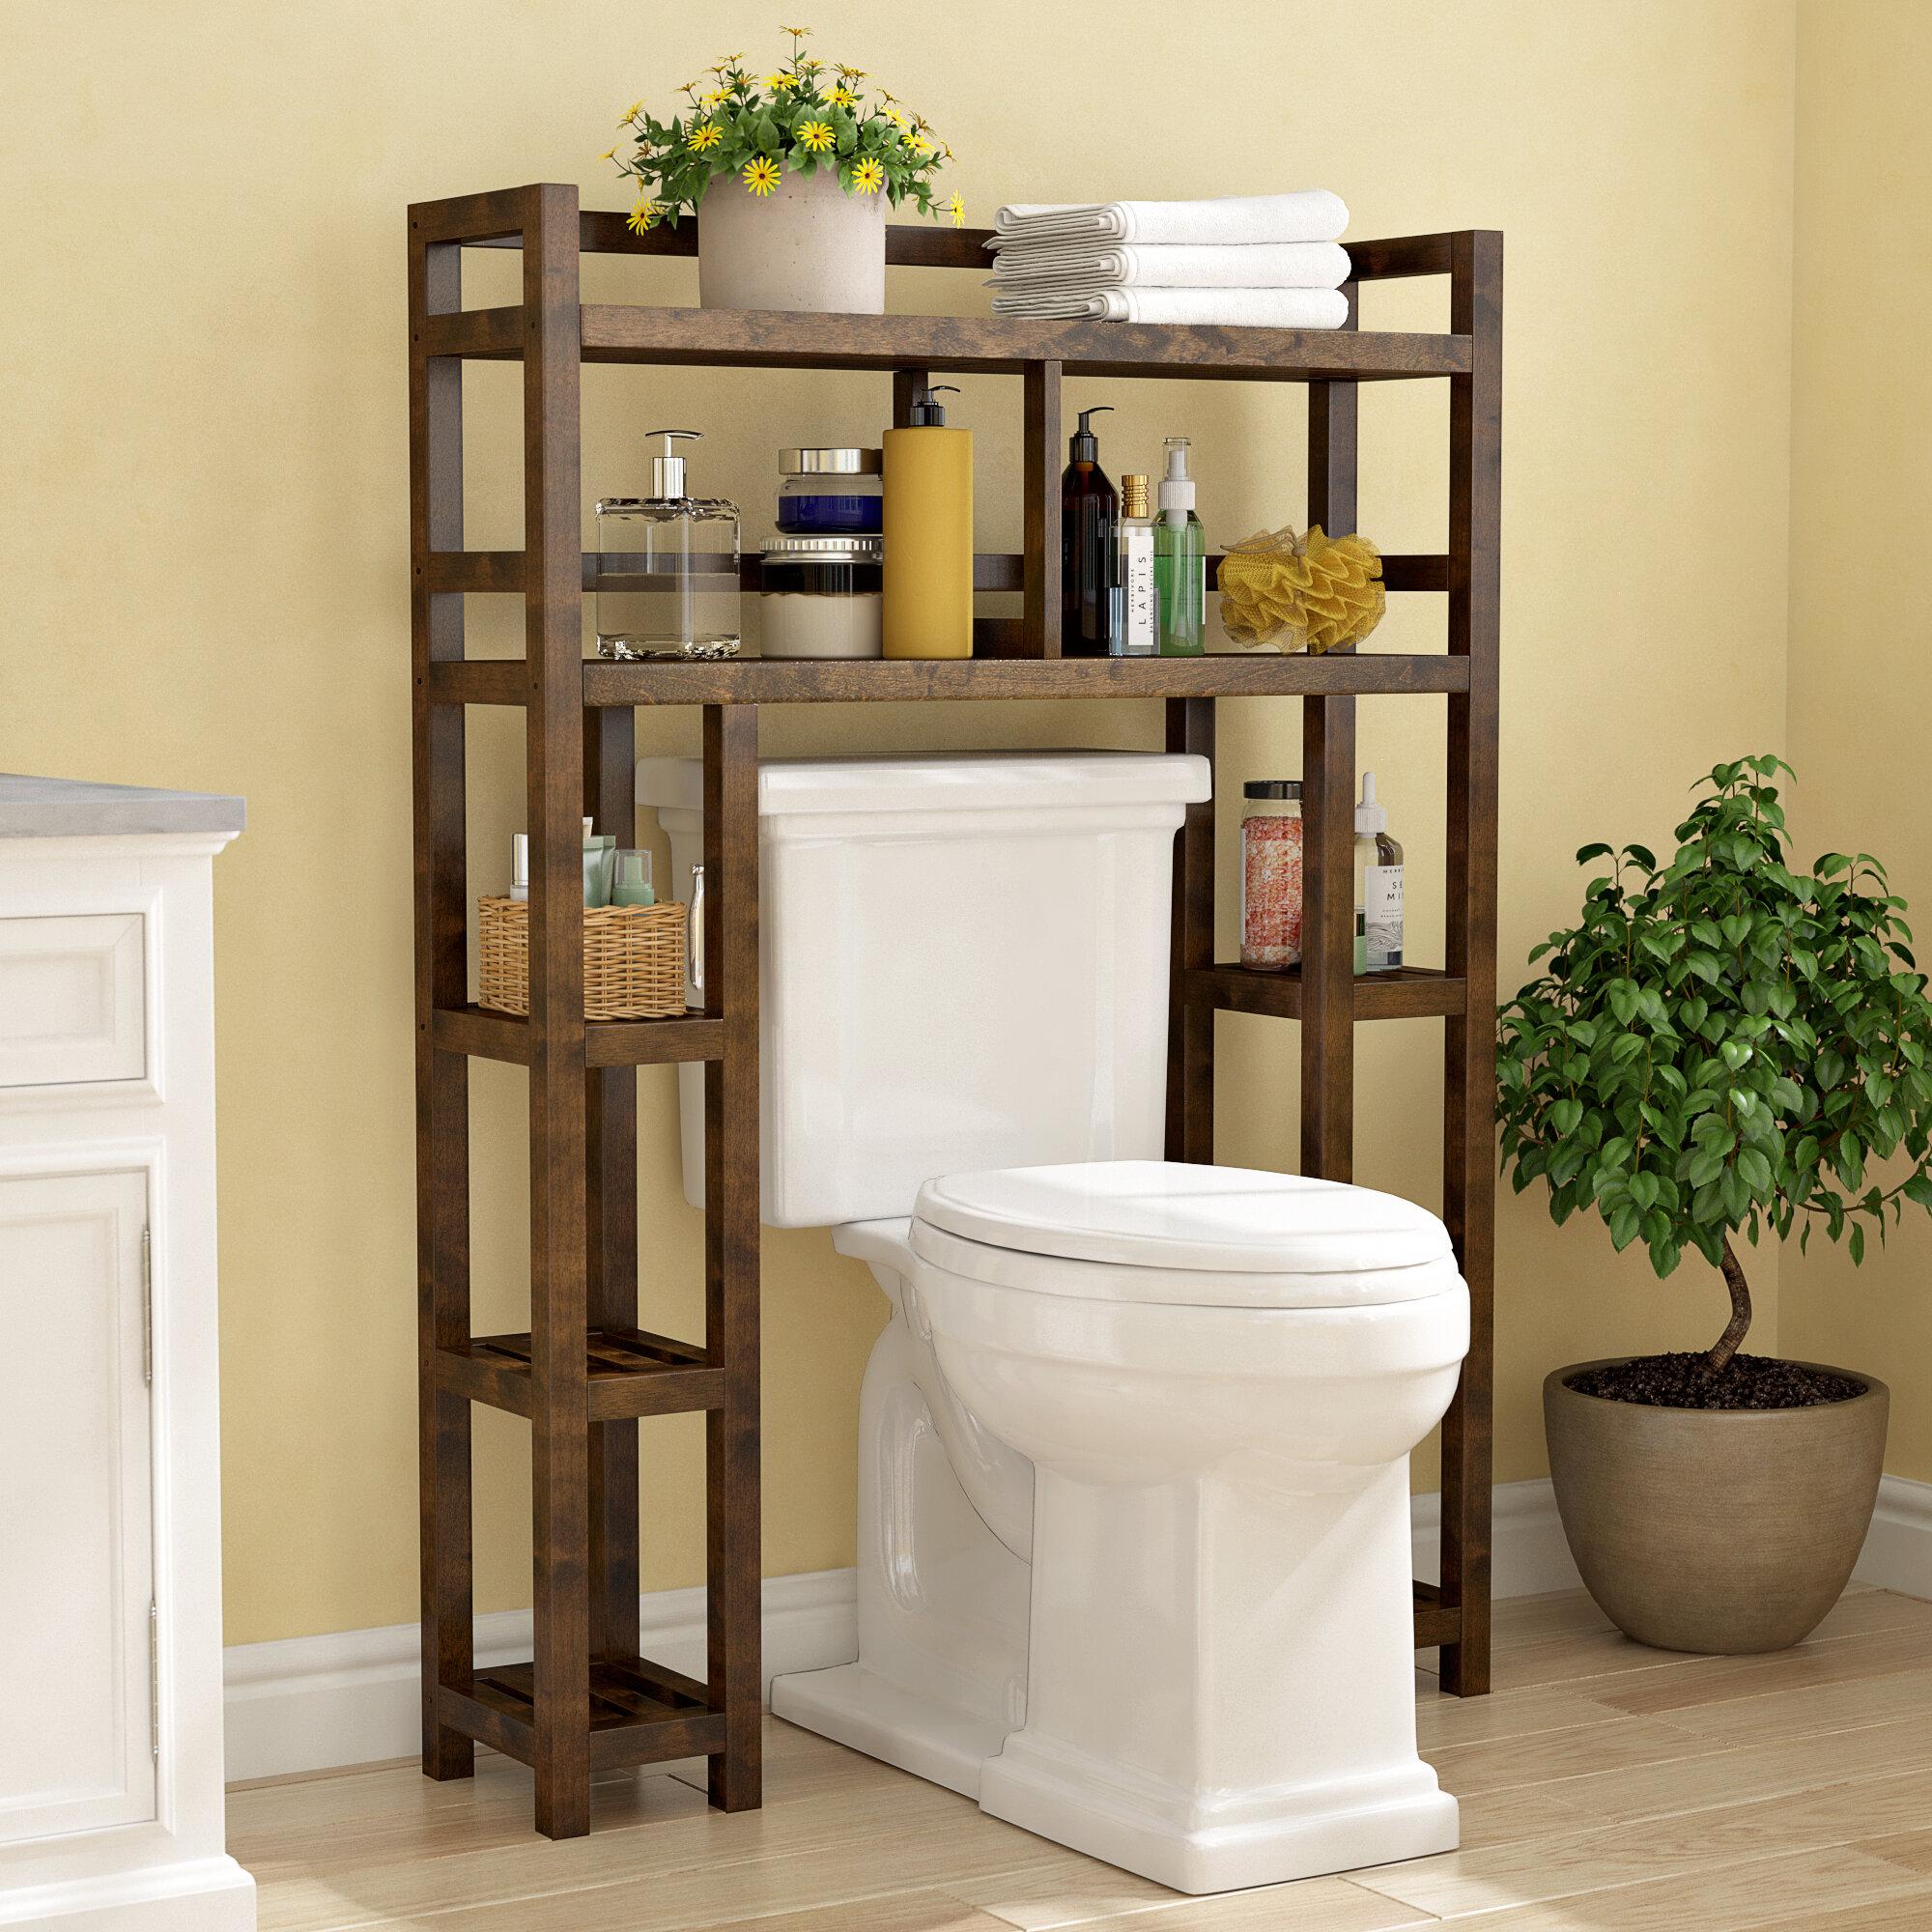 Three Posts Bernardston 34 5 W X 48 H X 9 D Solid Wood Free Standing Over The Toilet Storage Reviews Wayfair